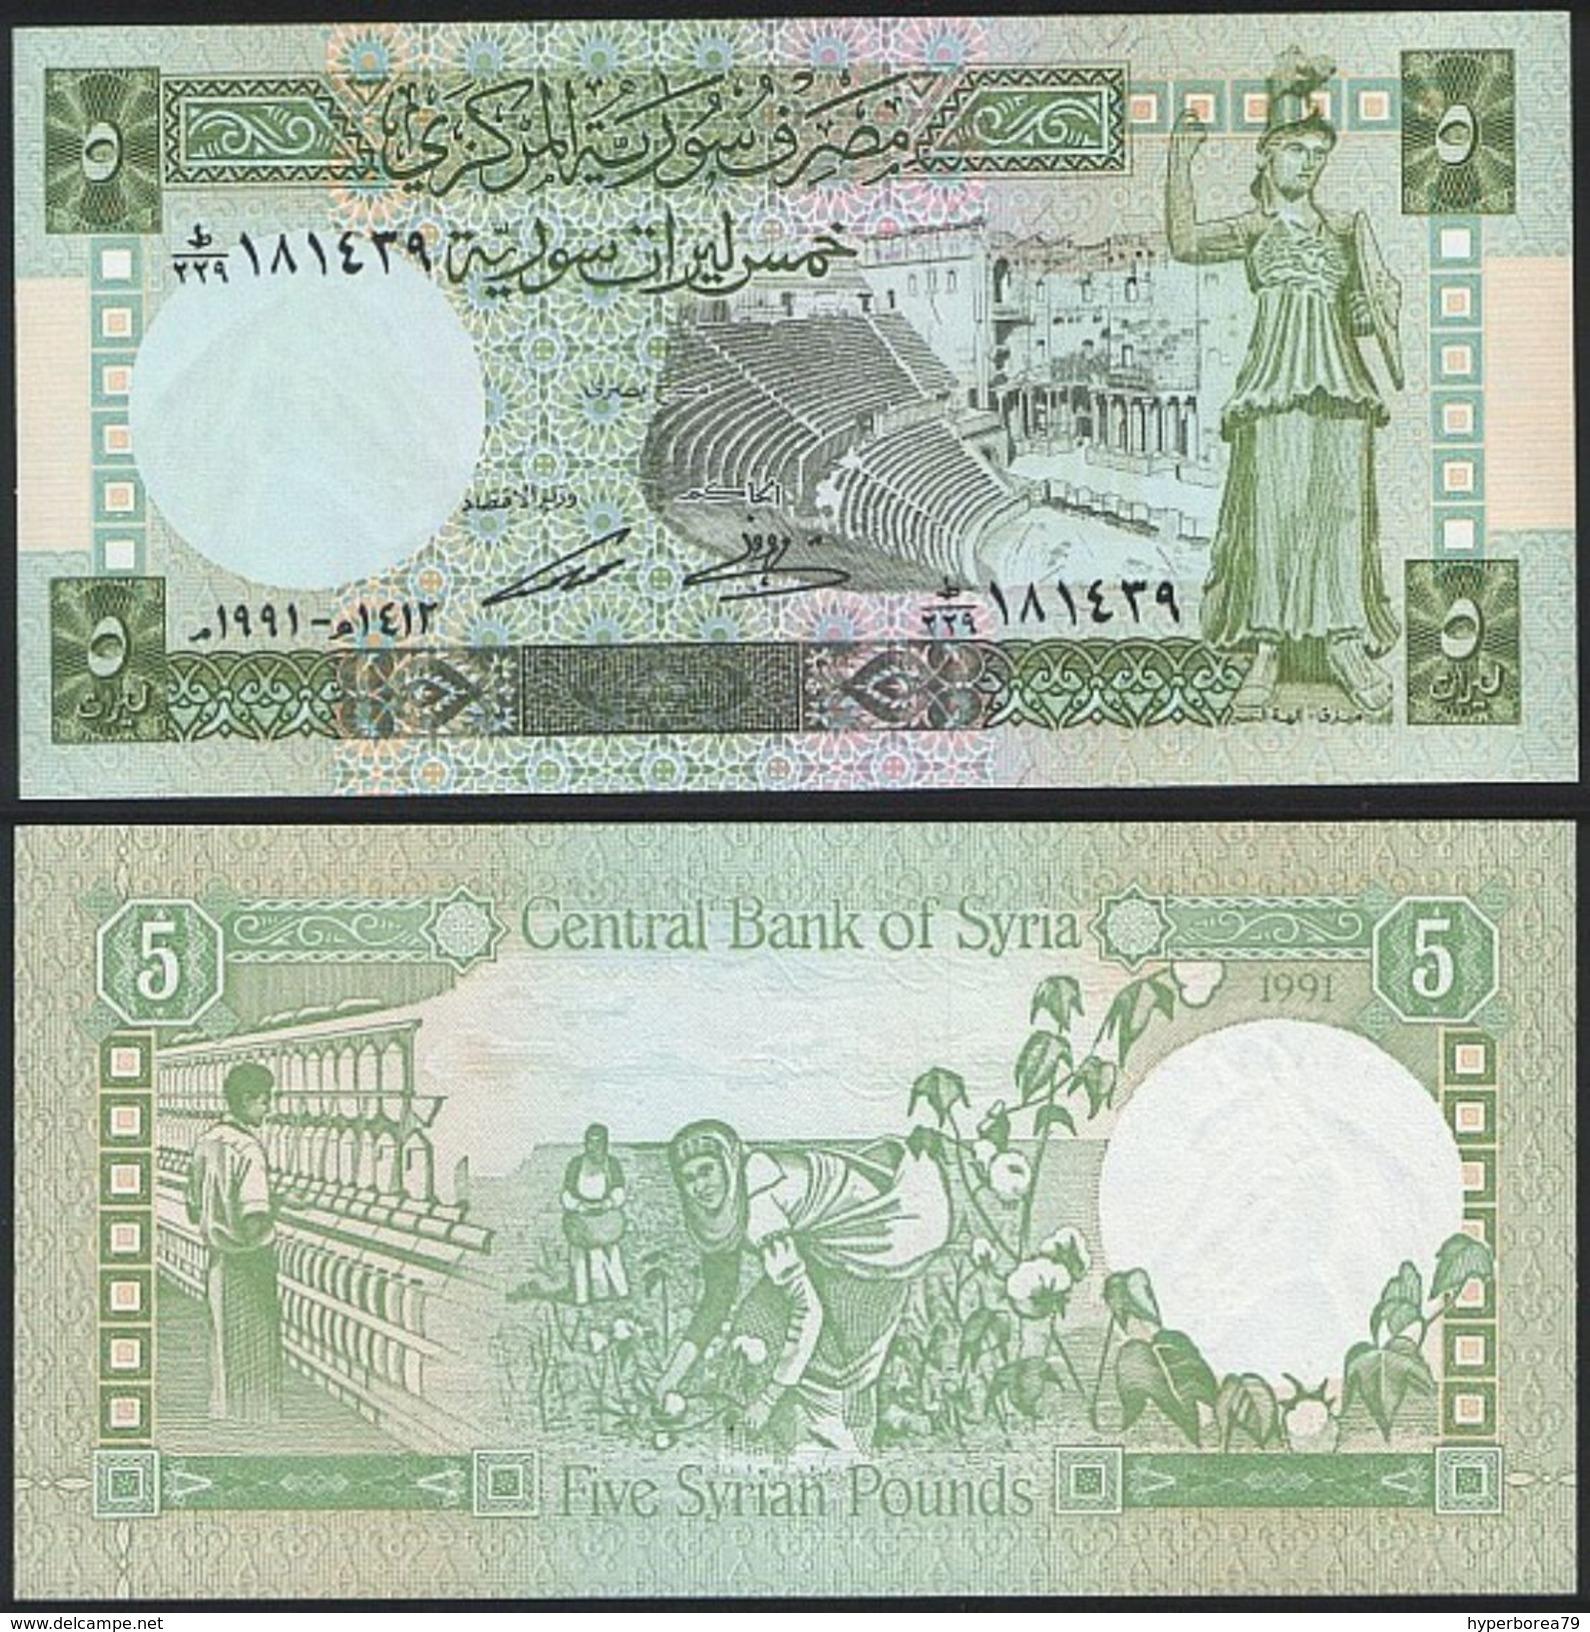 Syria P 100 E - 5 Pounds 1991 - UNC - Syrie